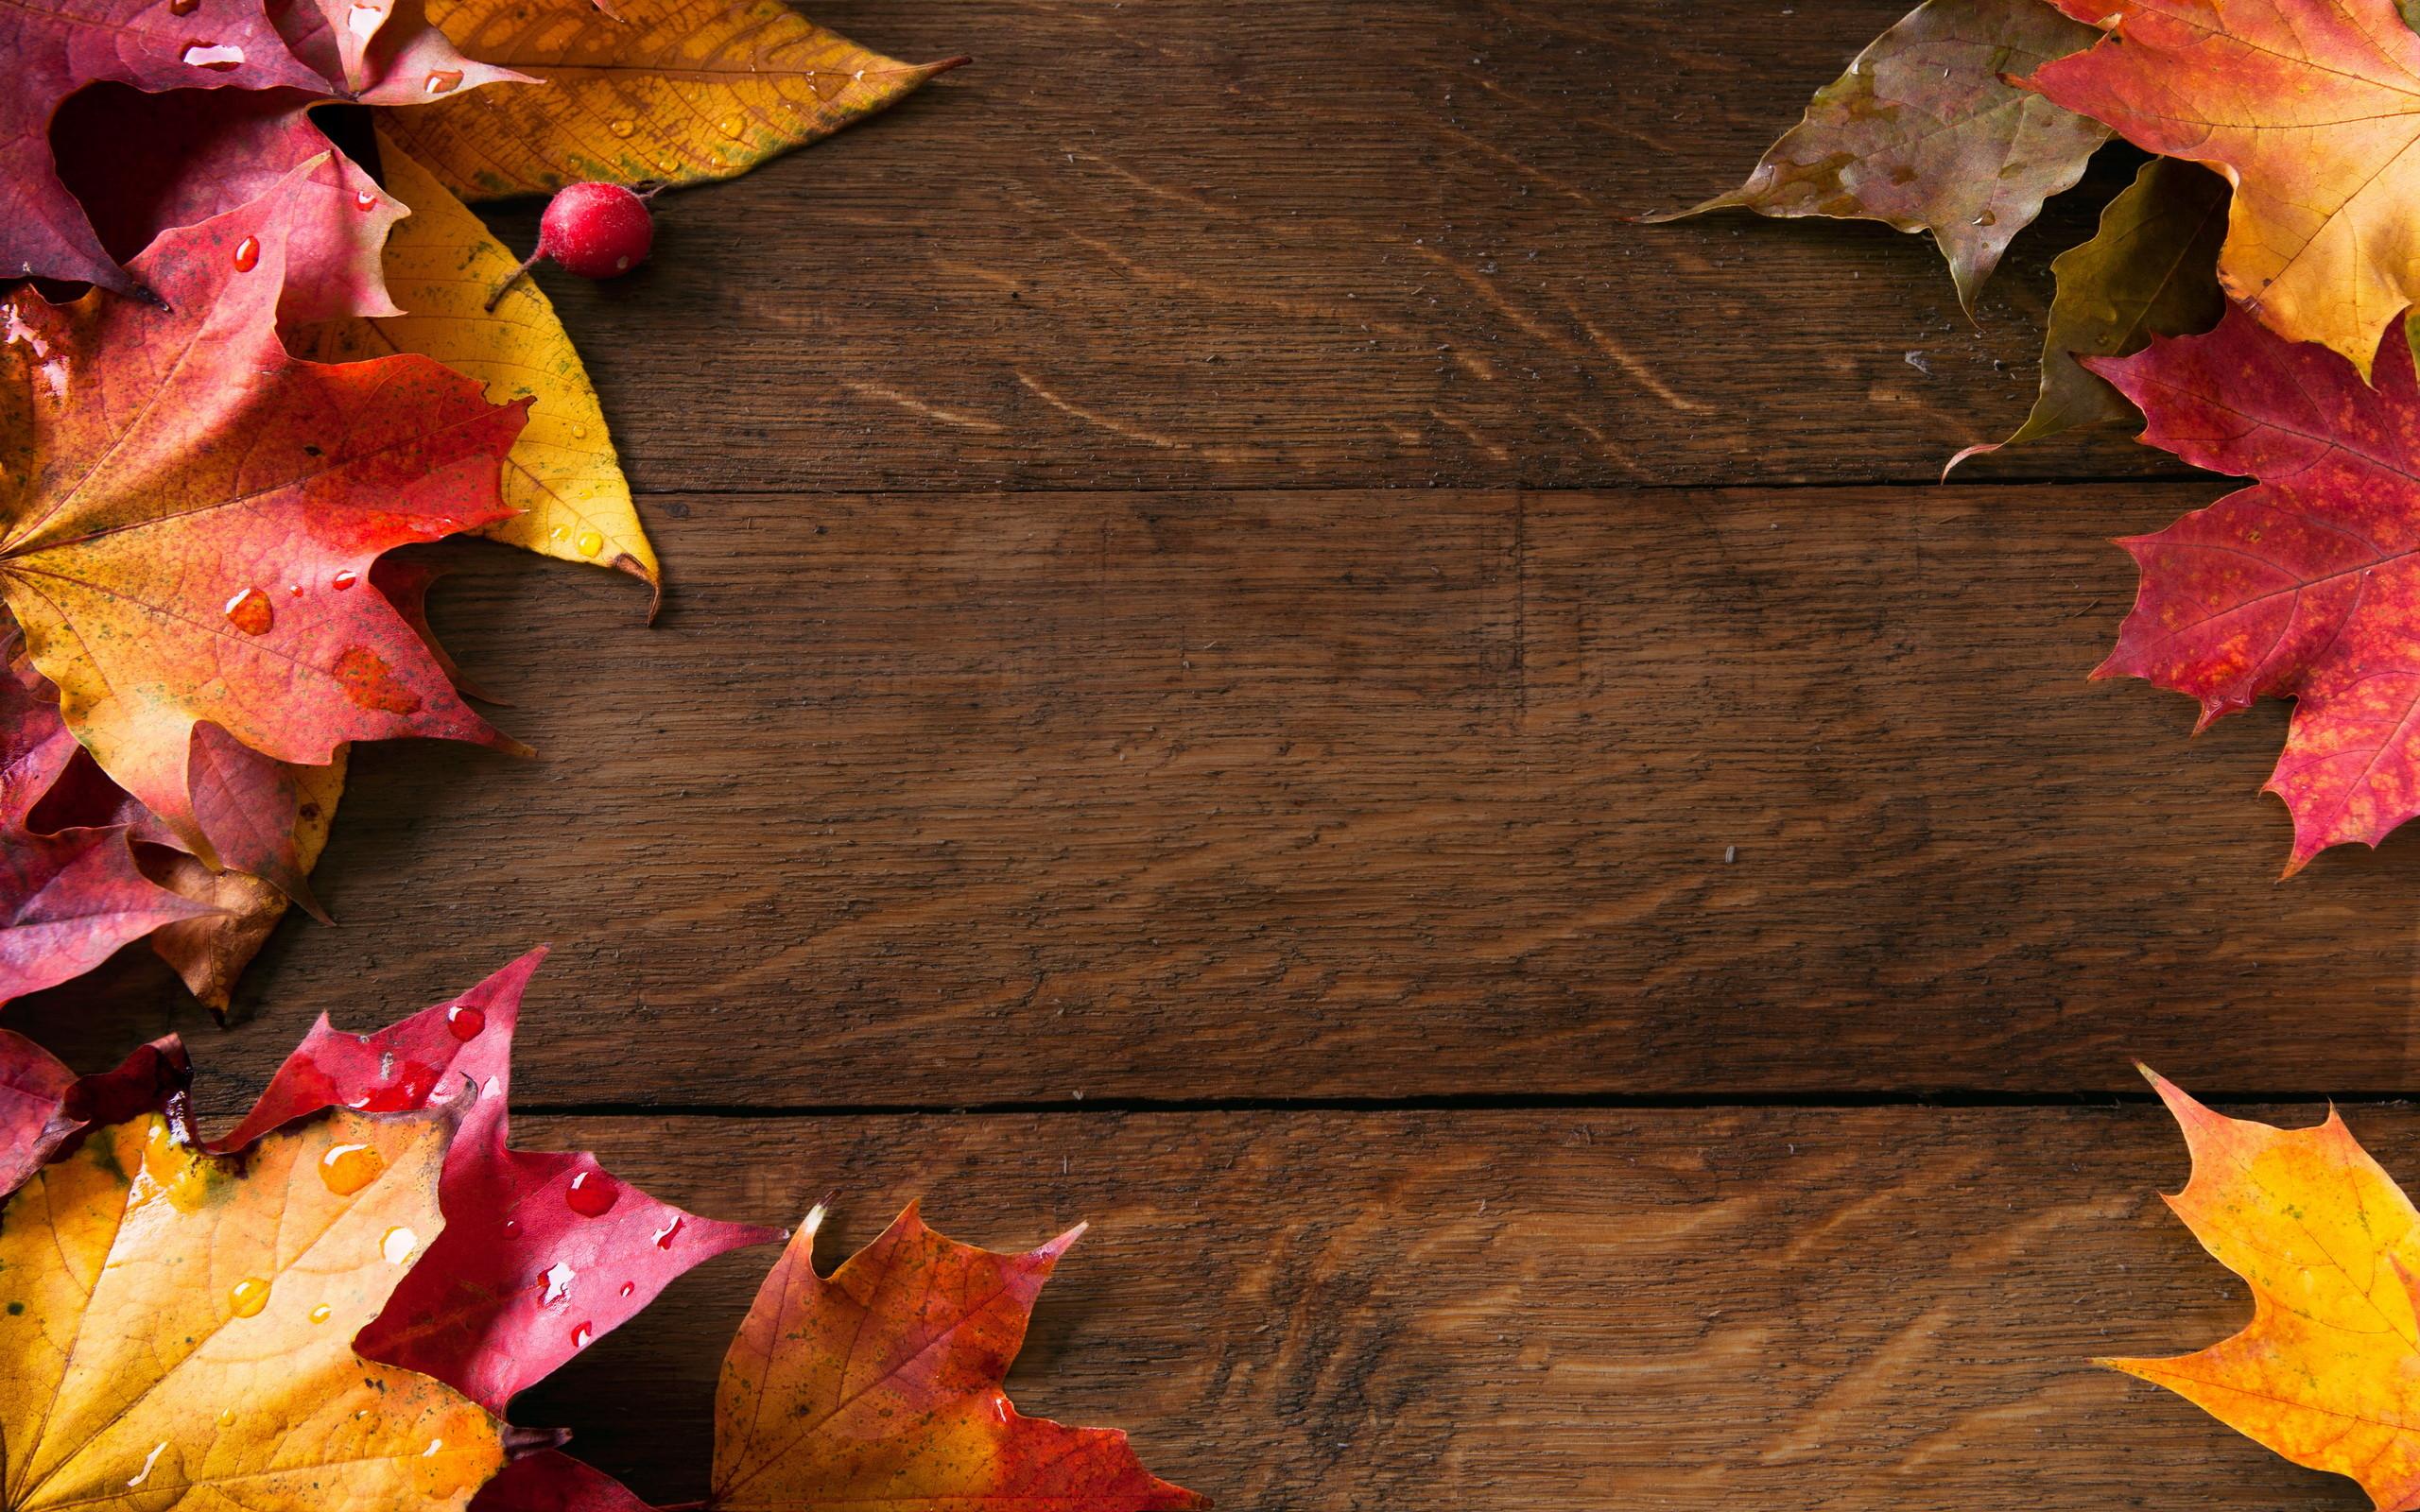 Best 25+ Autumn desktop wallpaper ideas on Pinterest | Fall wallpaper,  Wallpapers for desktop and Fall desktop backgrounds